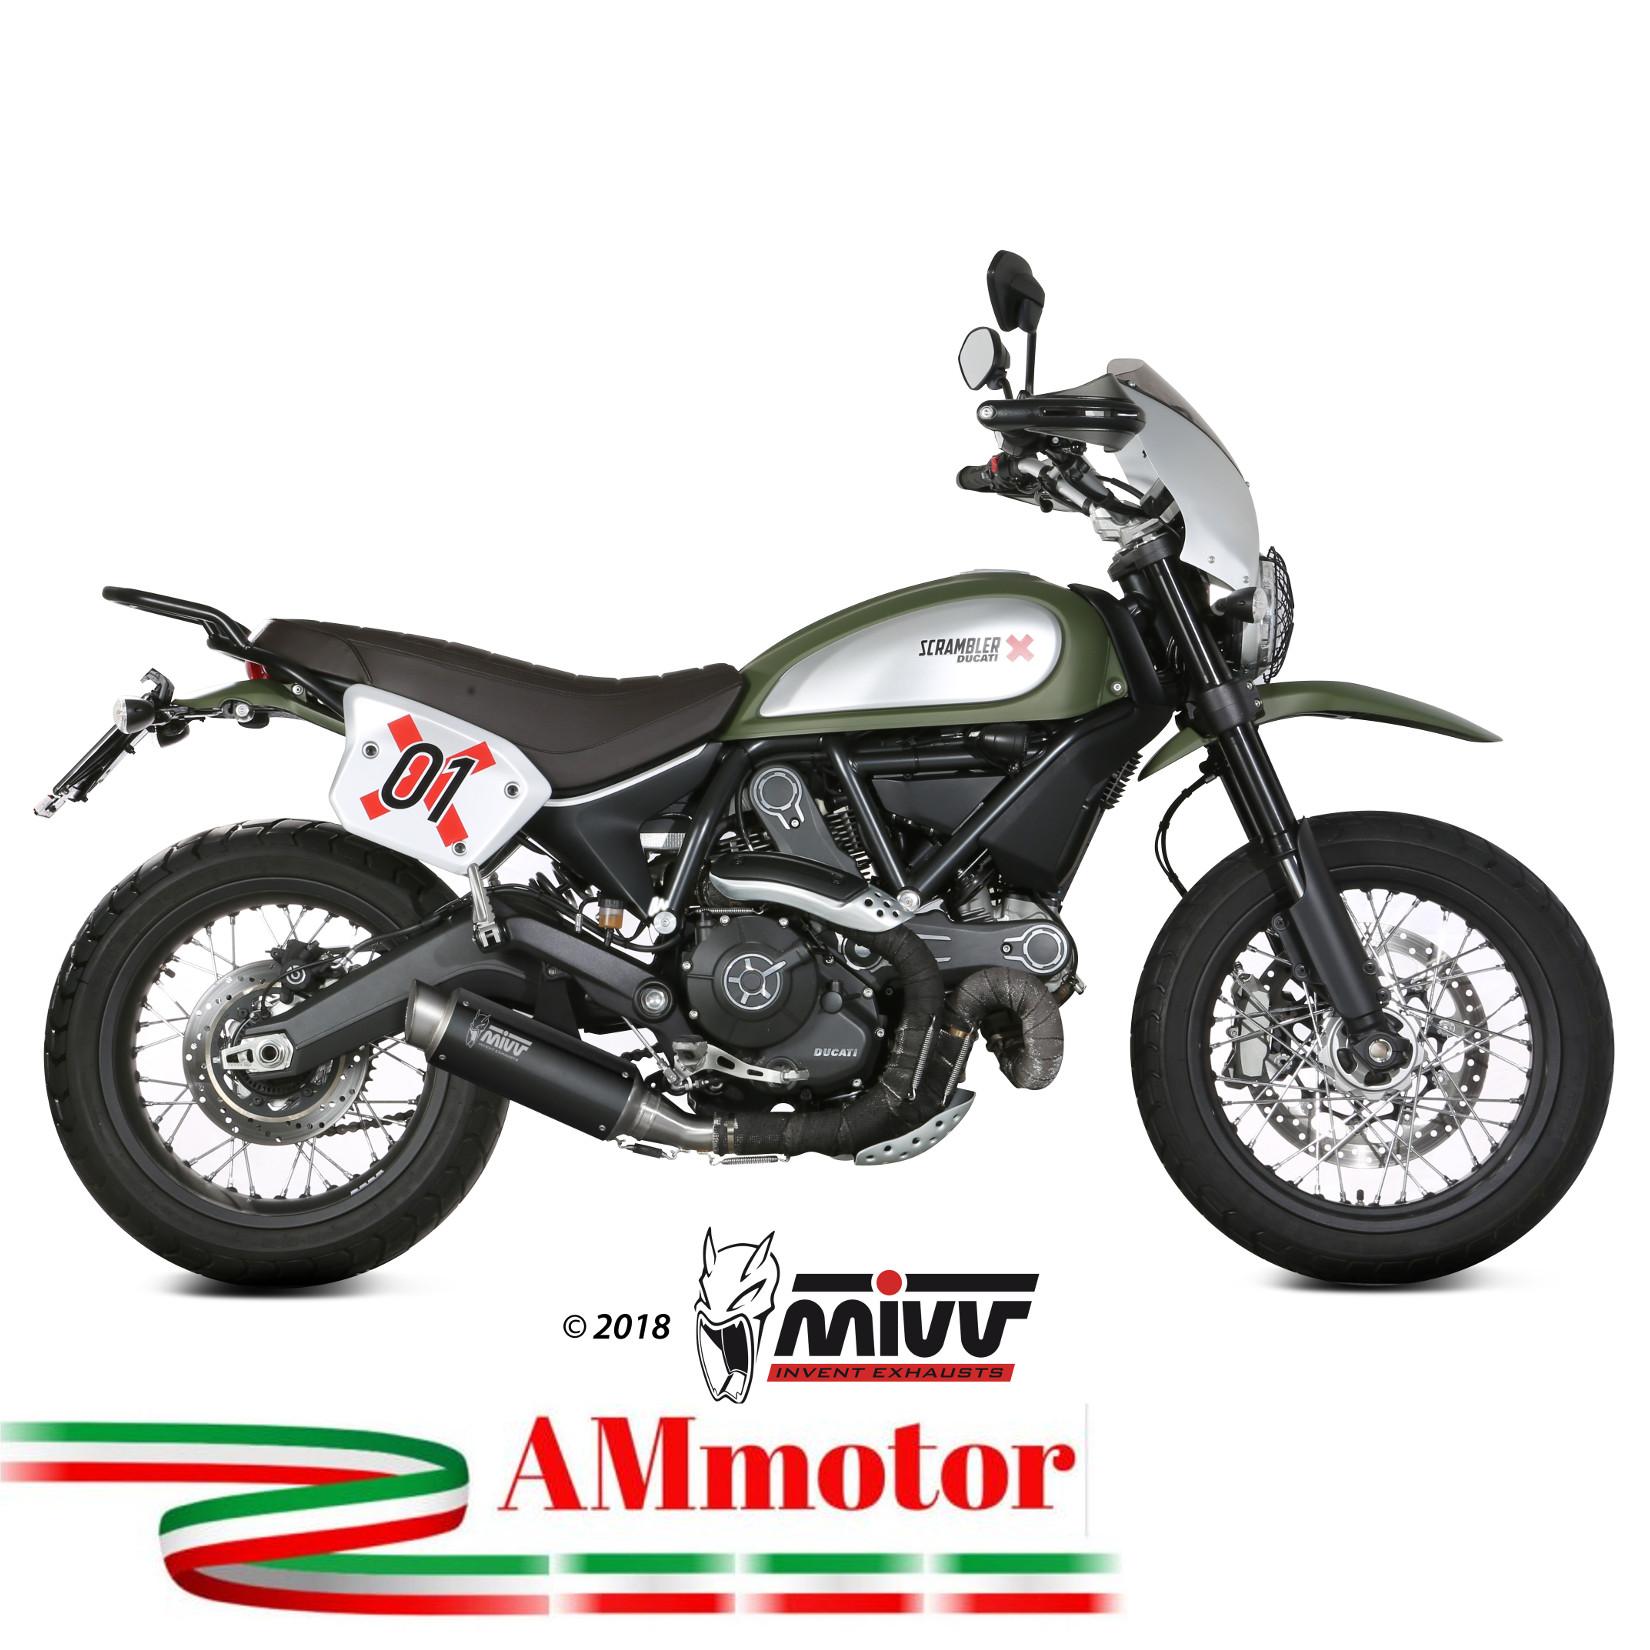 Exhaust Muffler Mivv Ducati Scrambler 800 2018 18 Gp Pro Black